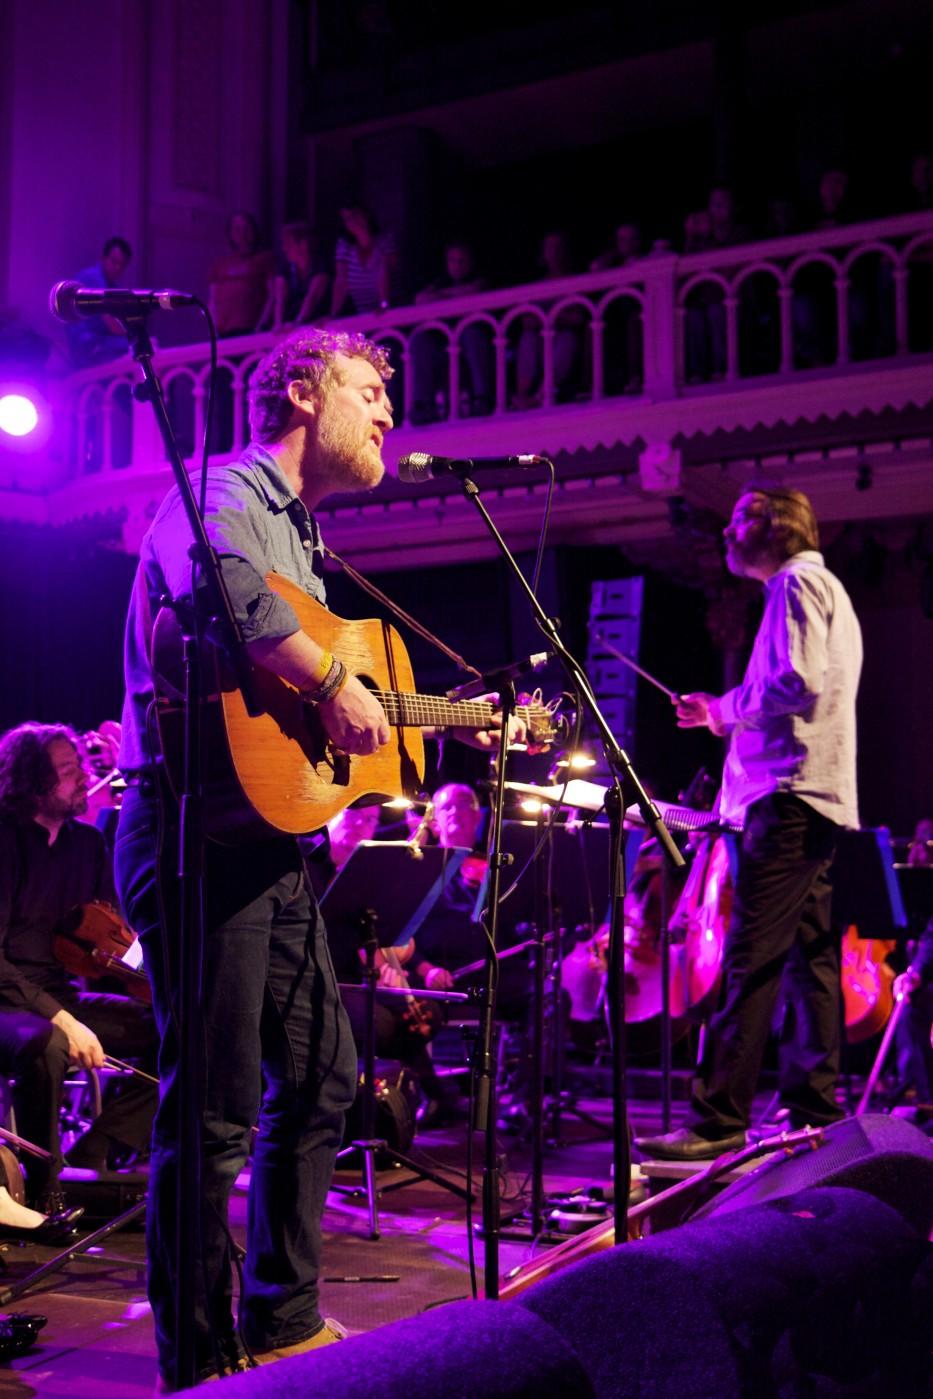 Glen Hansard Nico Muhly  BBC Scottish Symphony Orchestra veroveren Paradiso  Roots  Written